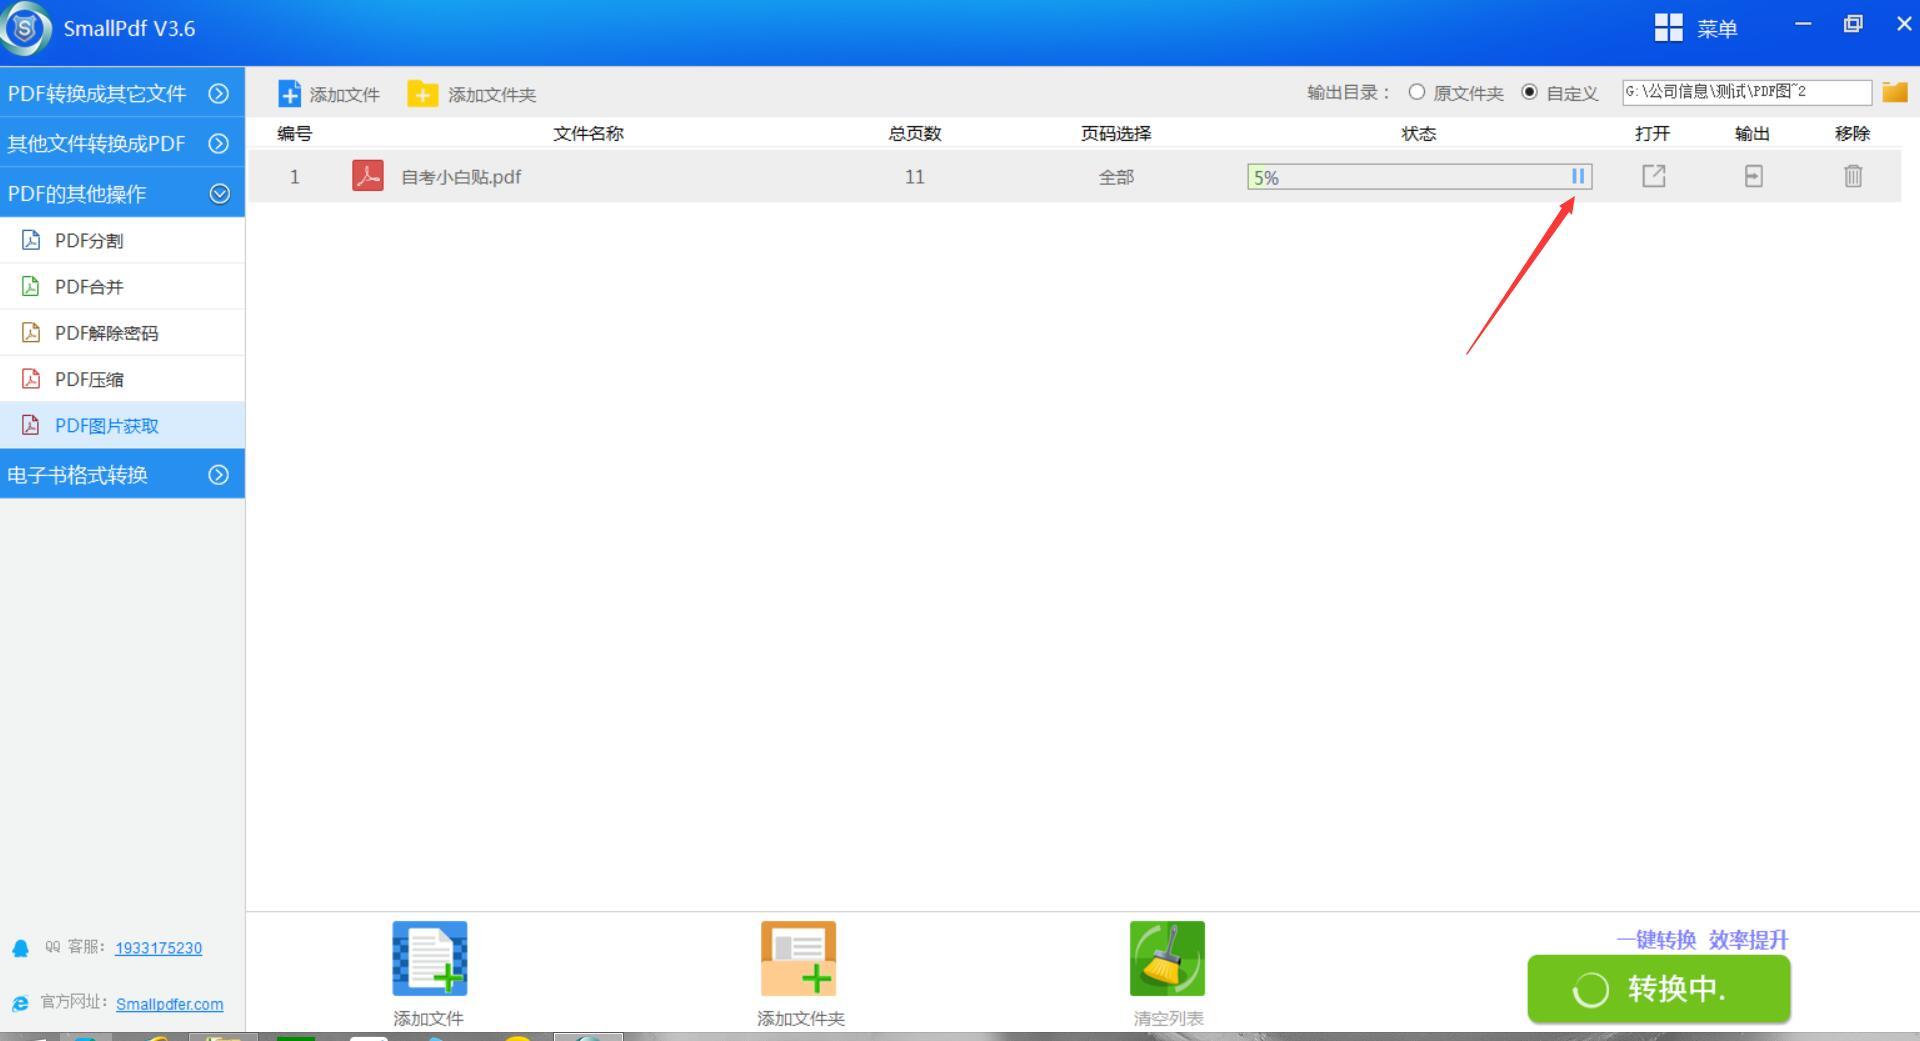 Small PDF转换成JPG软件PDF图片获取操作-5